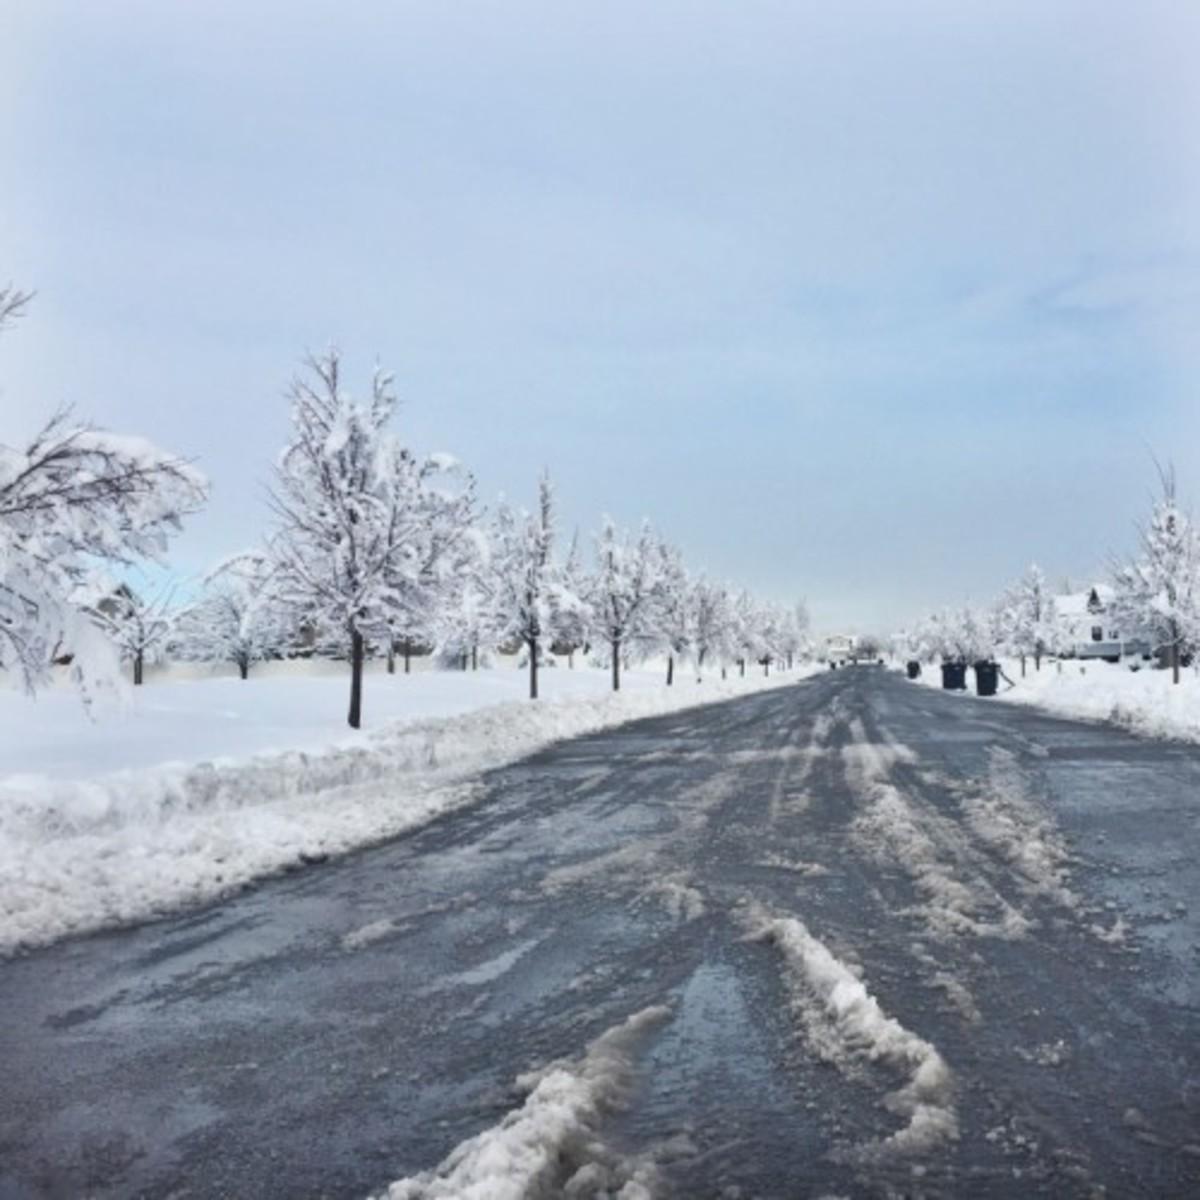 Boom! Winter arrived!